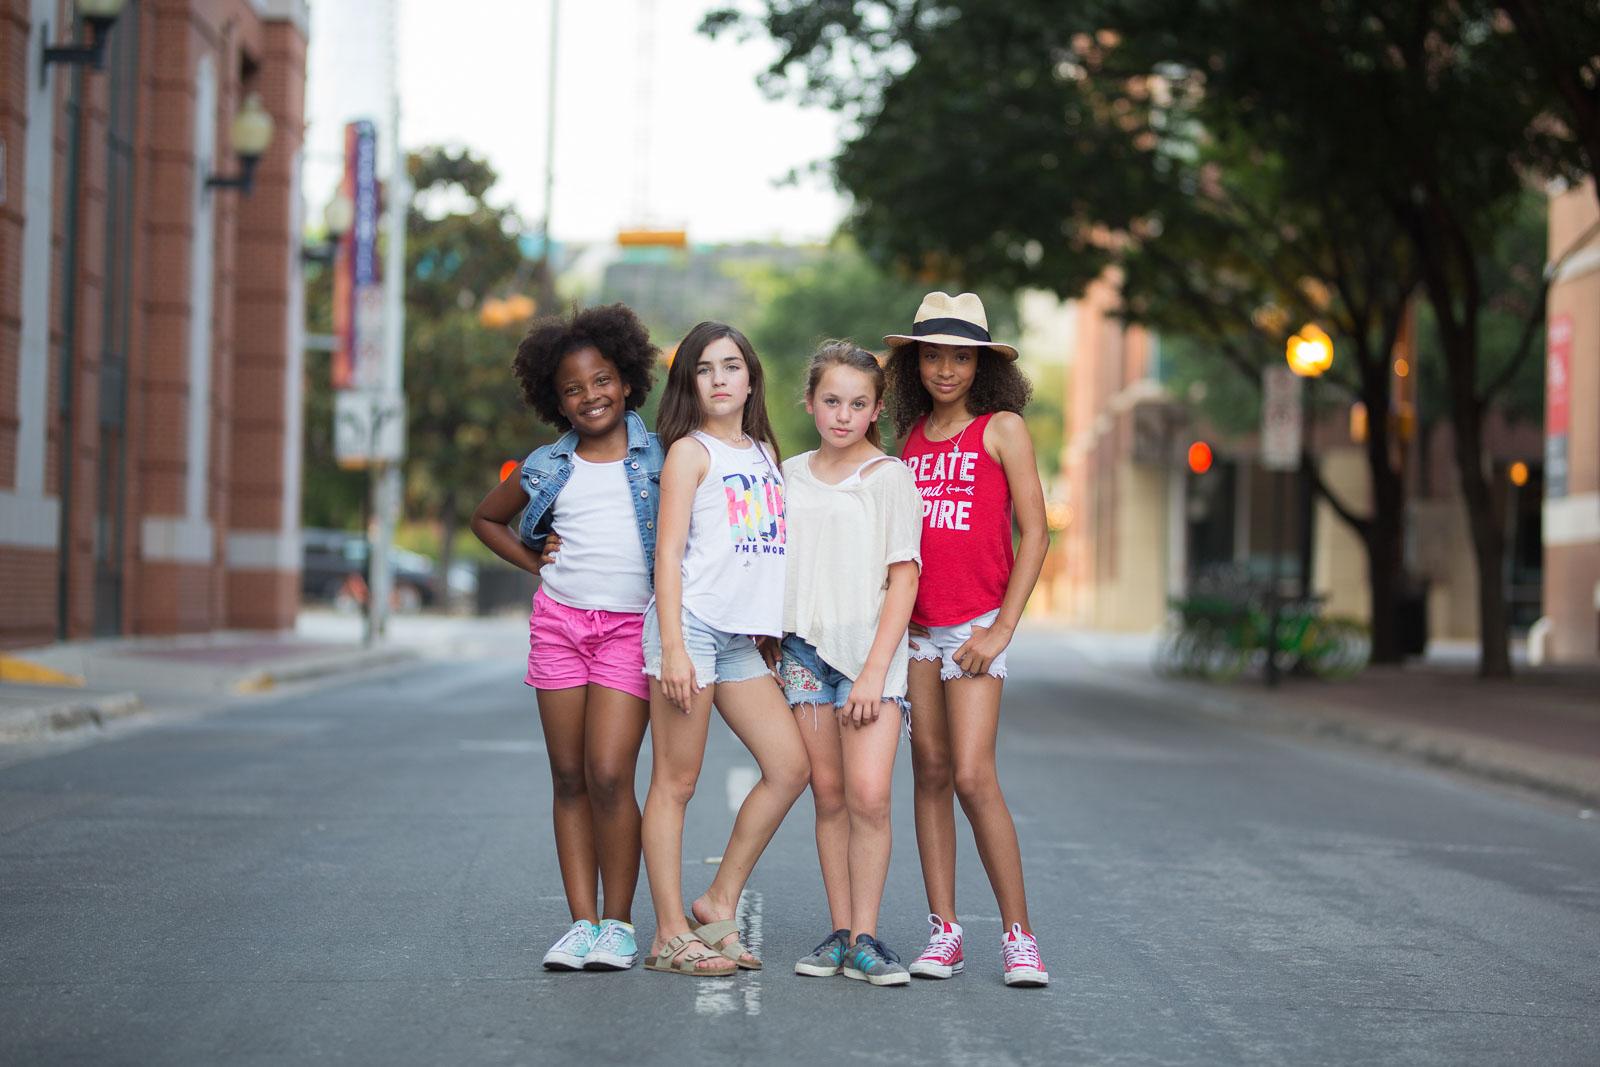 tween girls posing together in street kristina mccaleb